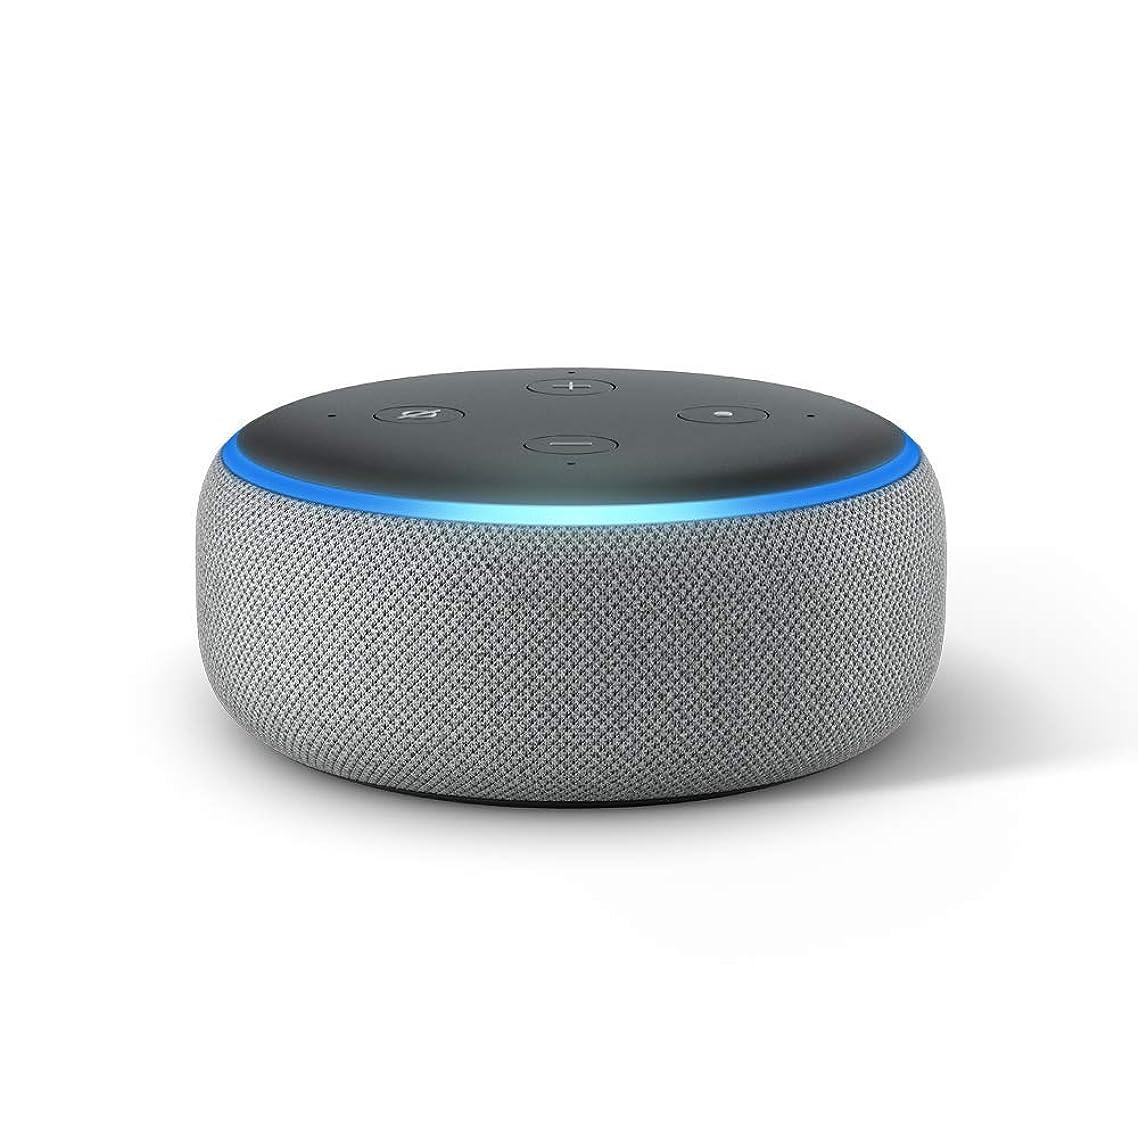 Certified Refurbished All-new Echo Dot (3rd Gen) - Smart speaker with Alexa - Heather Gray